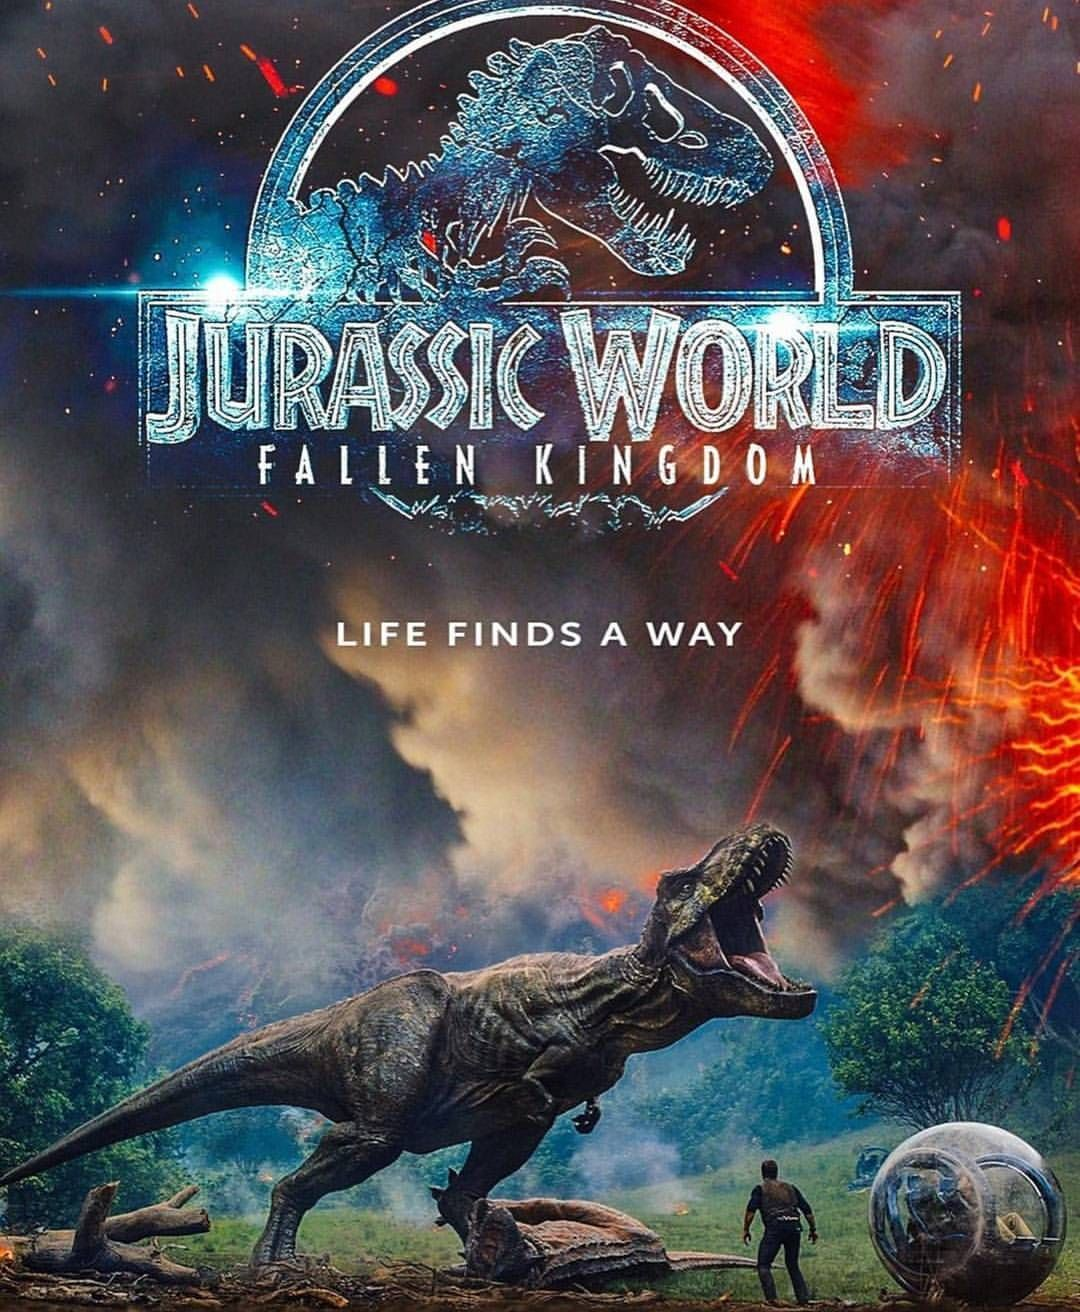 Jurassic World Fallen Kingdom 2018 Dual Audio HC TS 480p